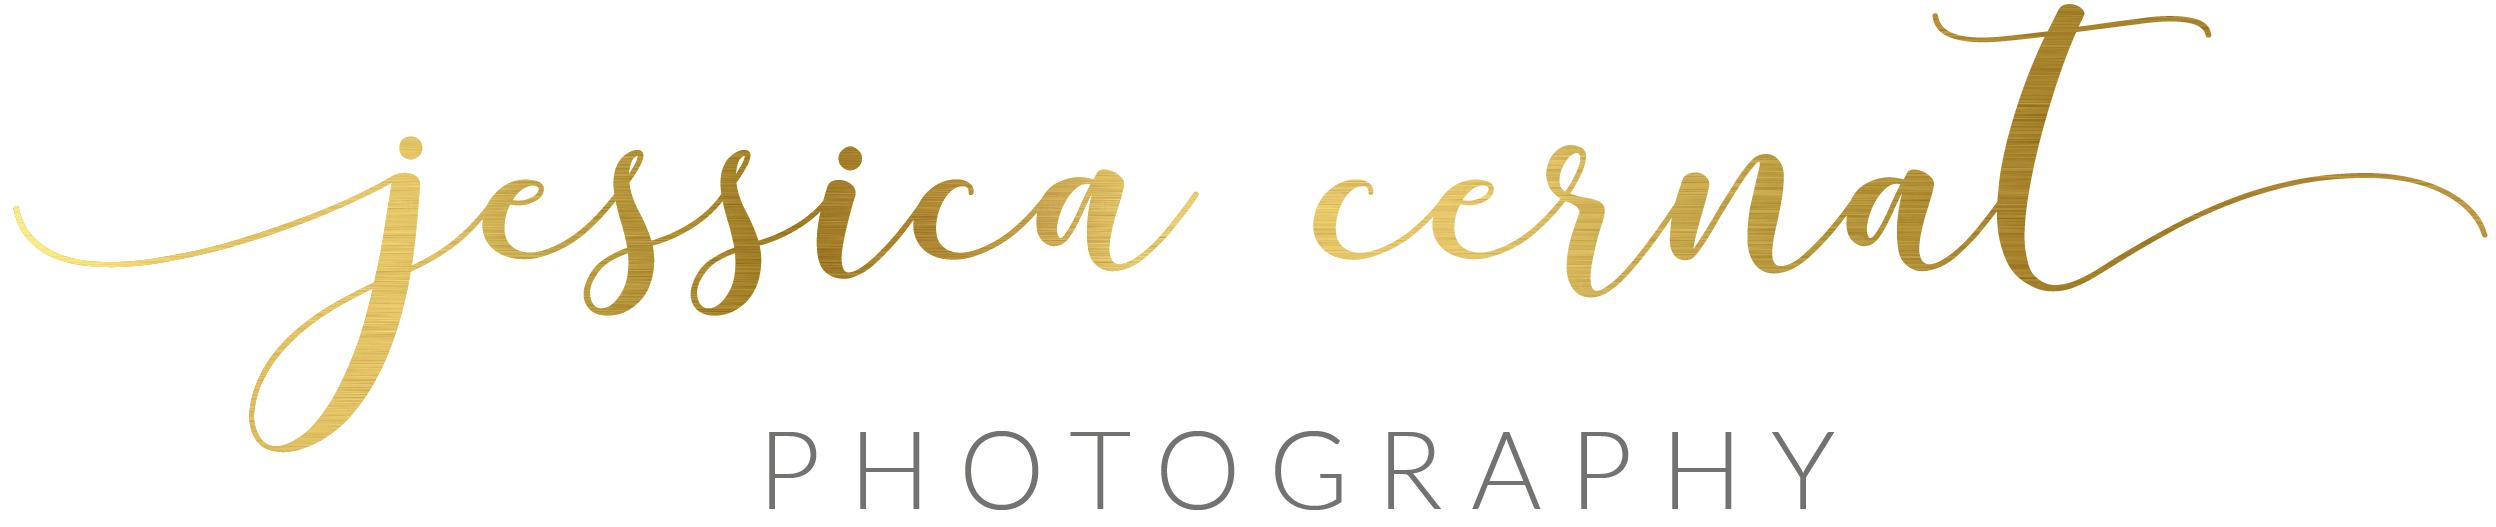 Jessica Cernat Photography